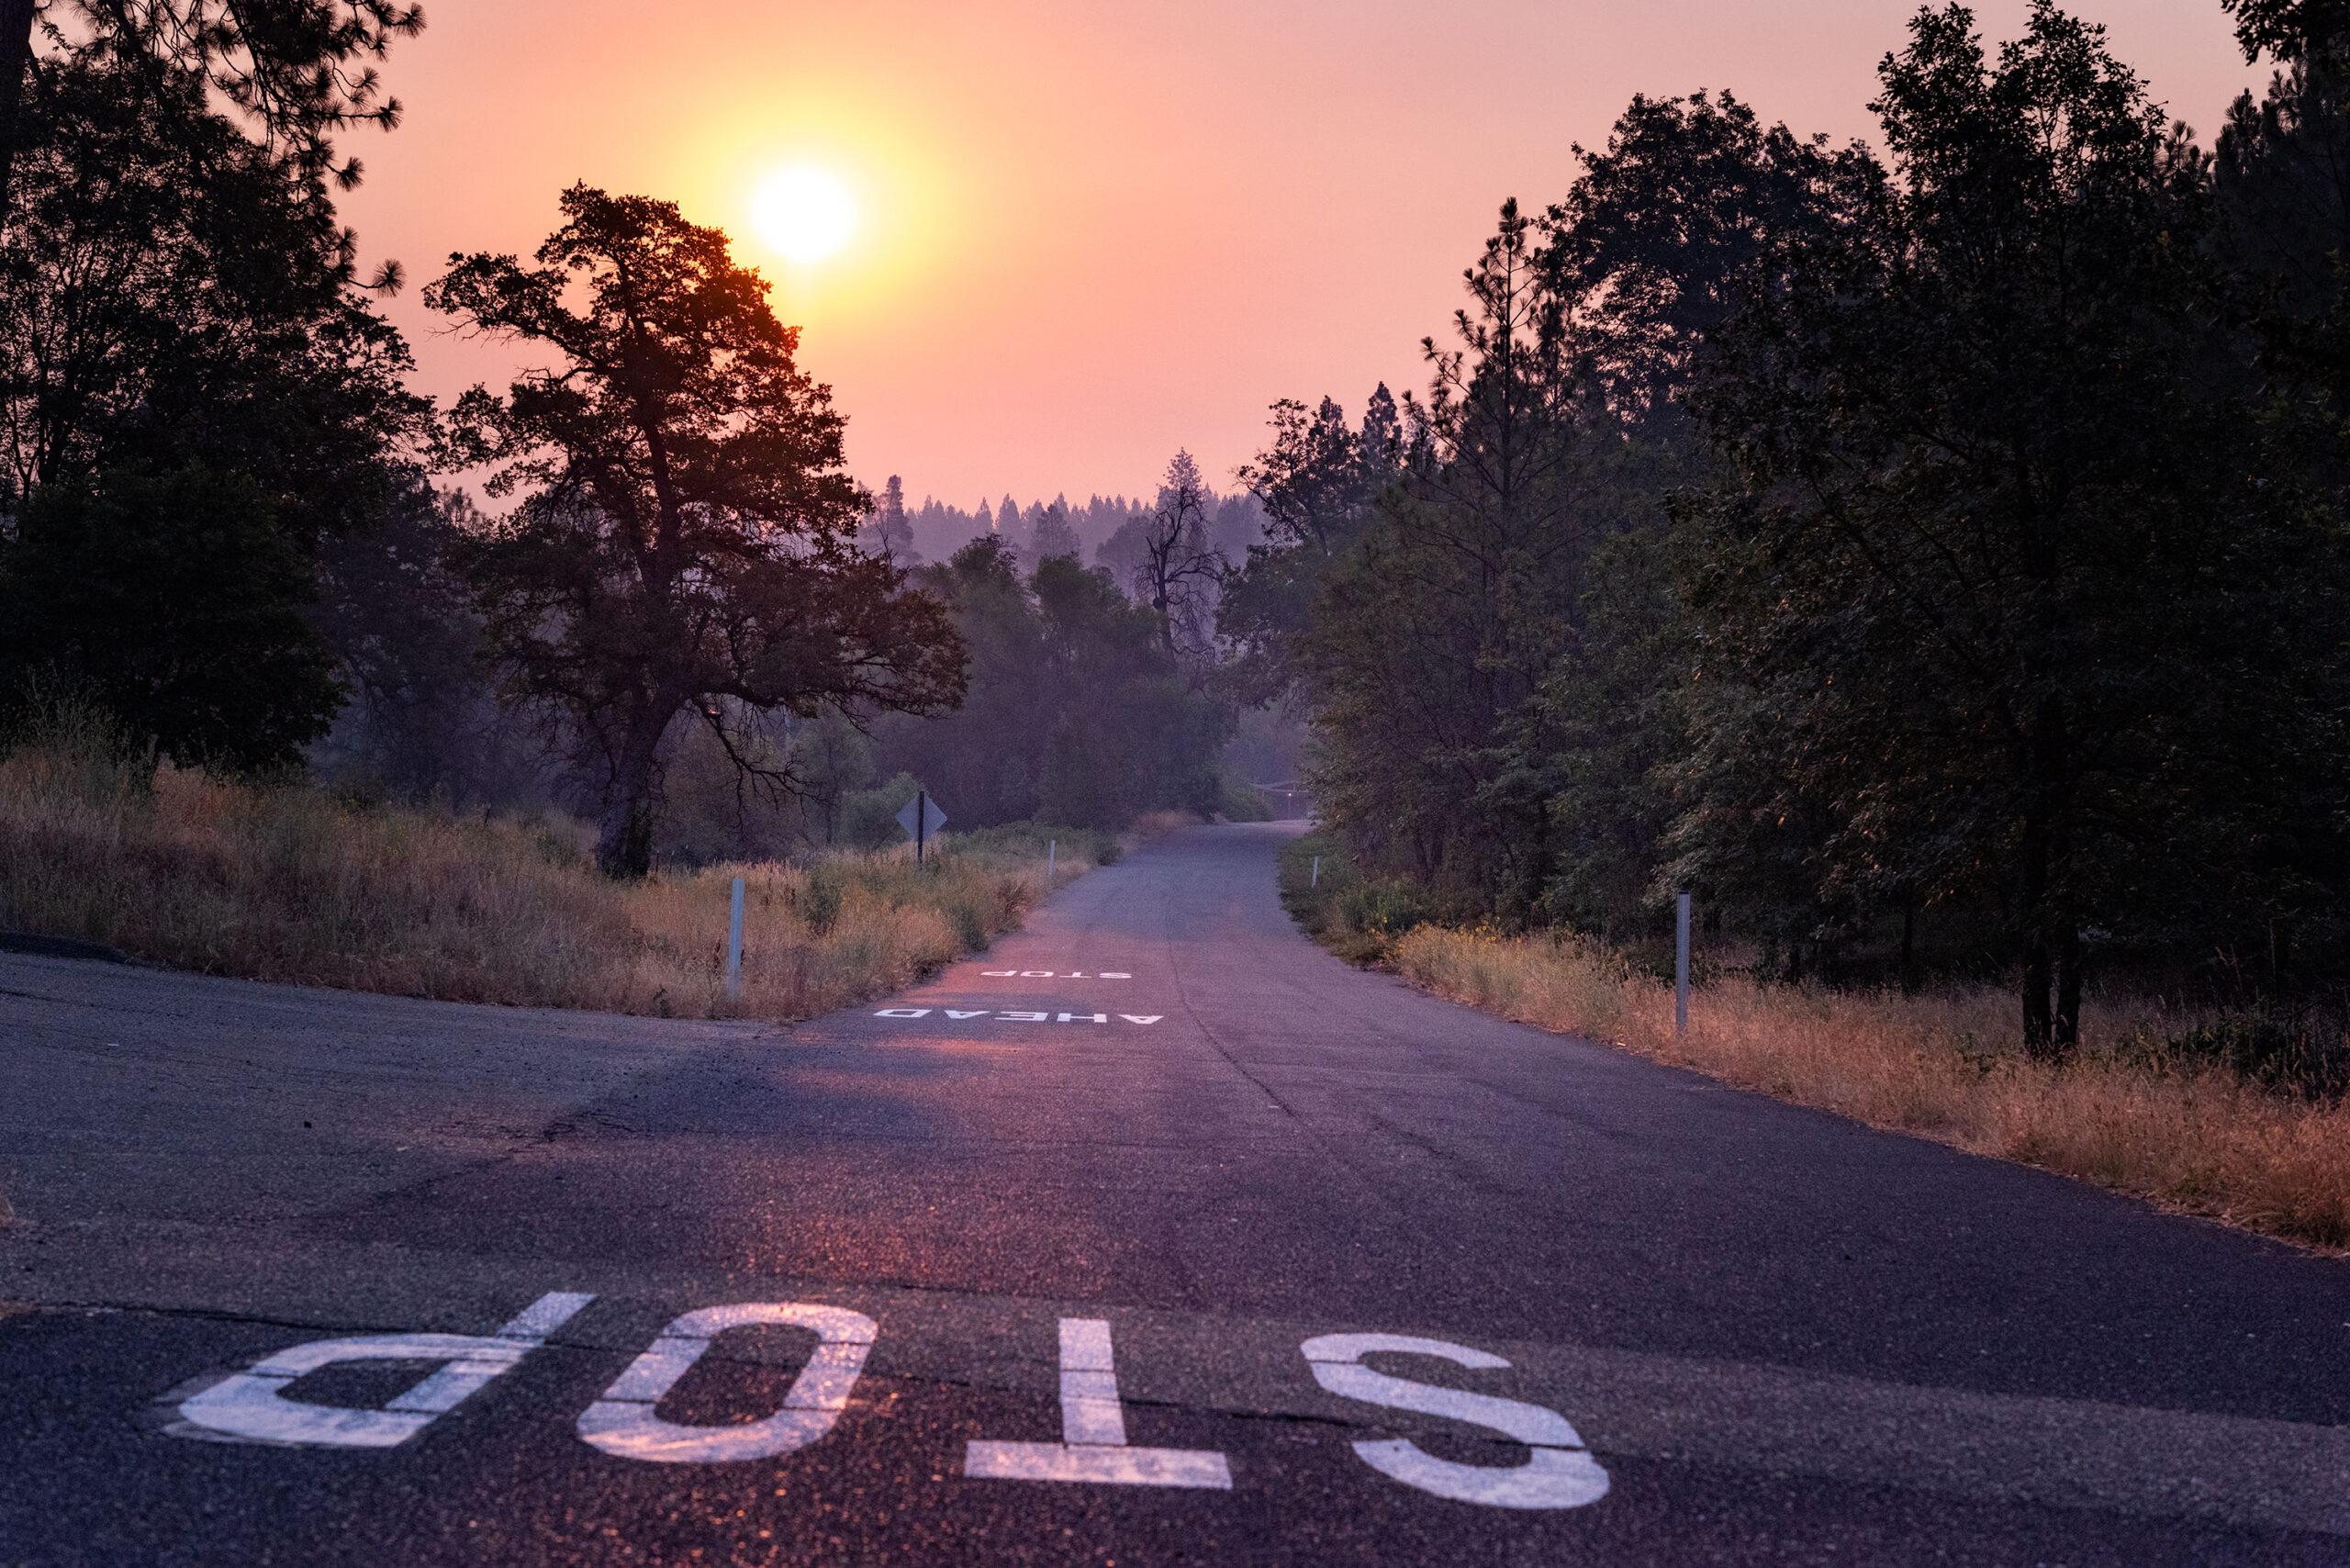 Sunrise photography on the road to Yosemite National Park taken by landscape photographer Jennifer Esseiva.